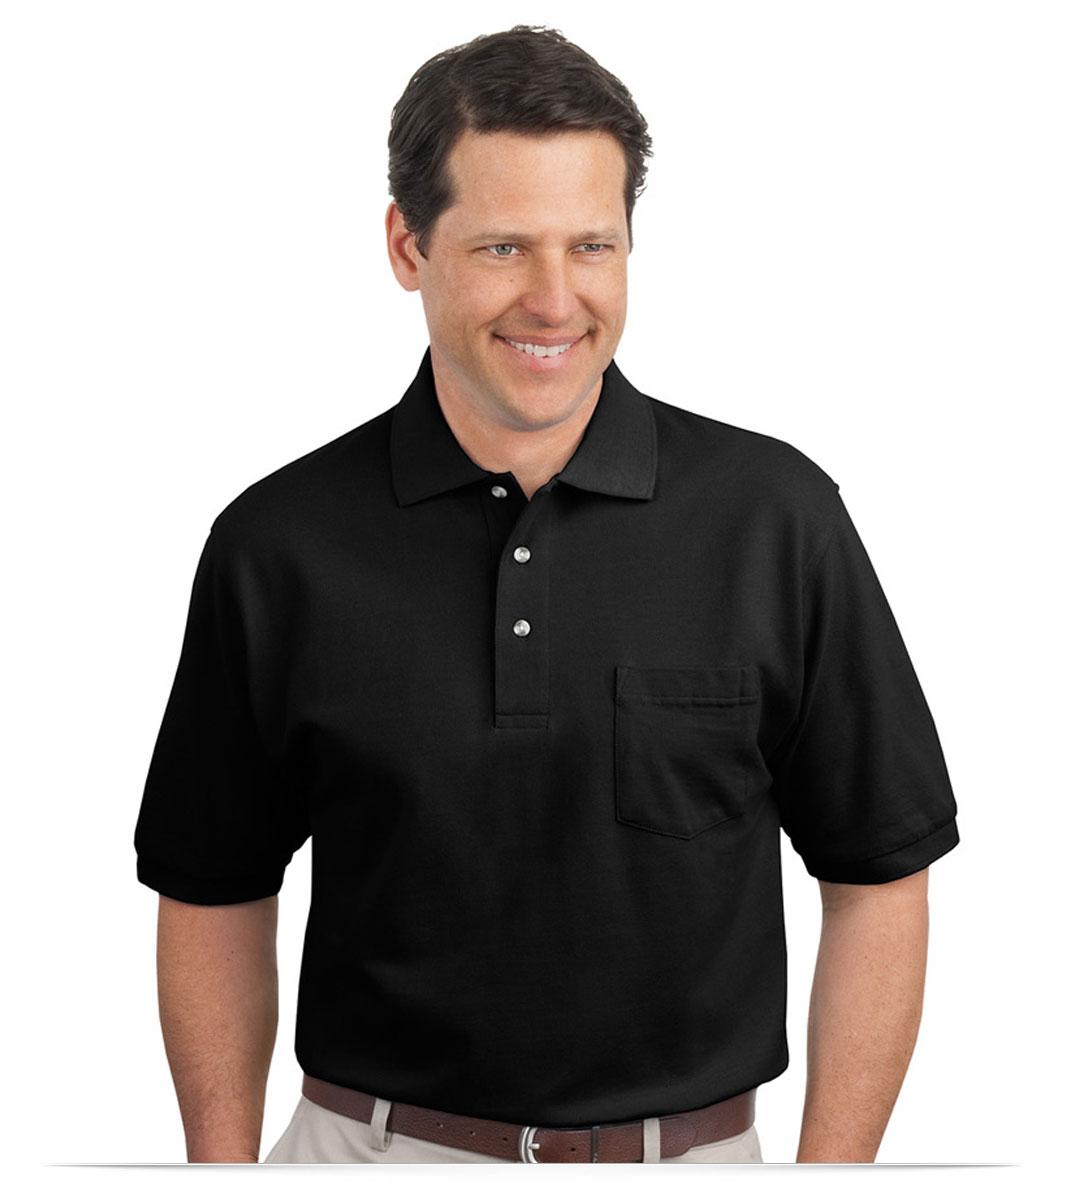 Embroidered Logo Pique Knit Pocket Polo Shirt